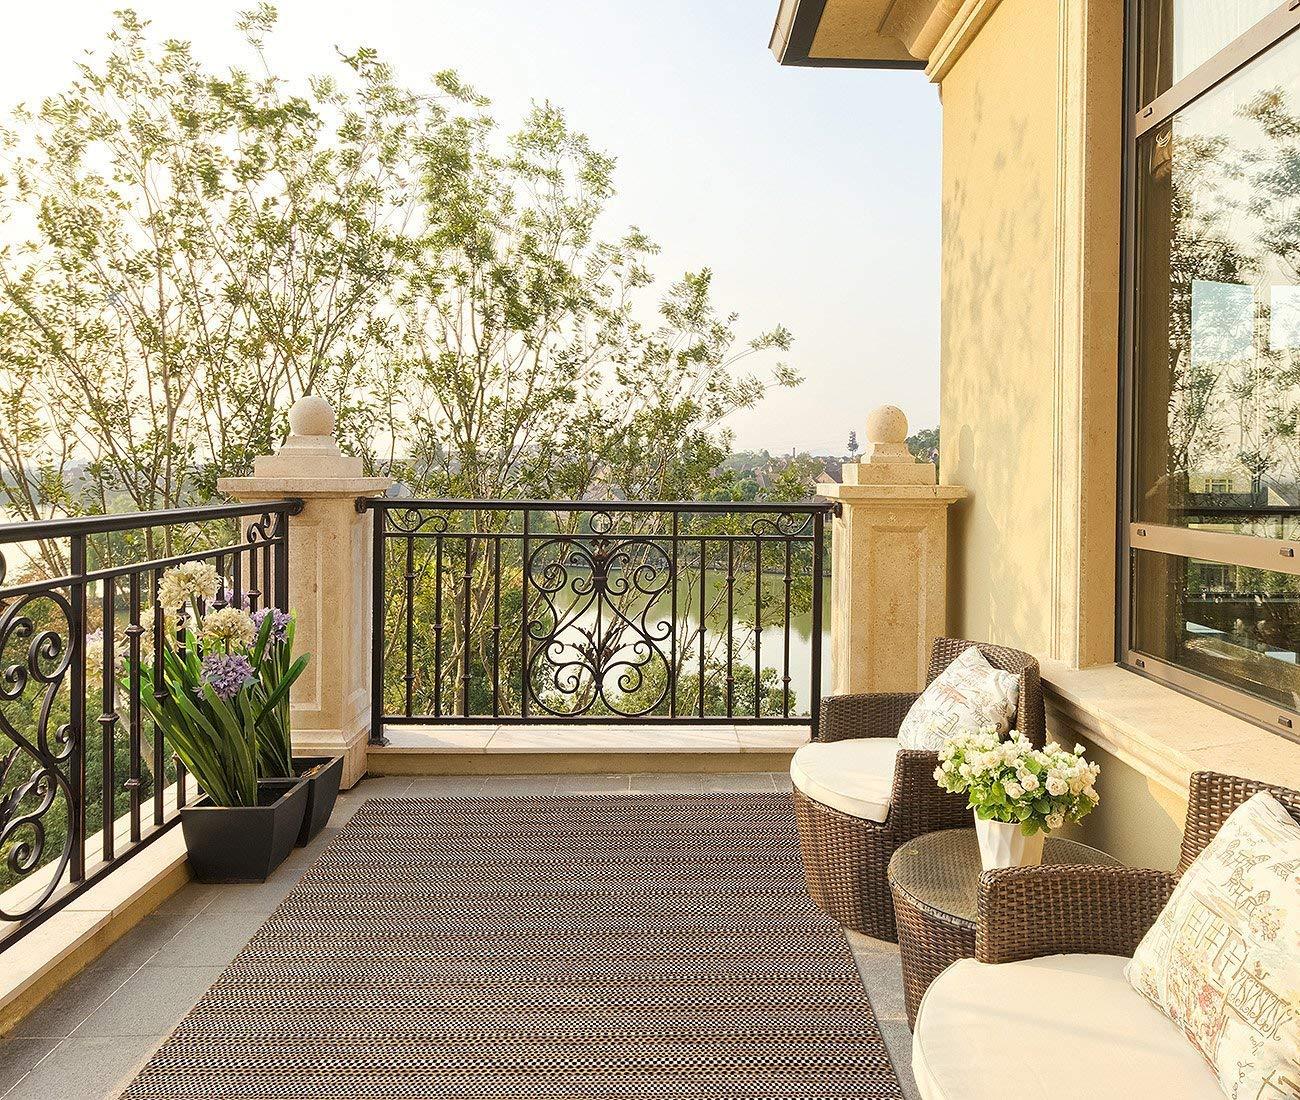 brown jordan furniture amazon com rh amazon com Sling Patio Furniture Brown Jordan Outdoor Patio Furniture